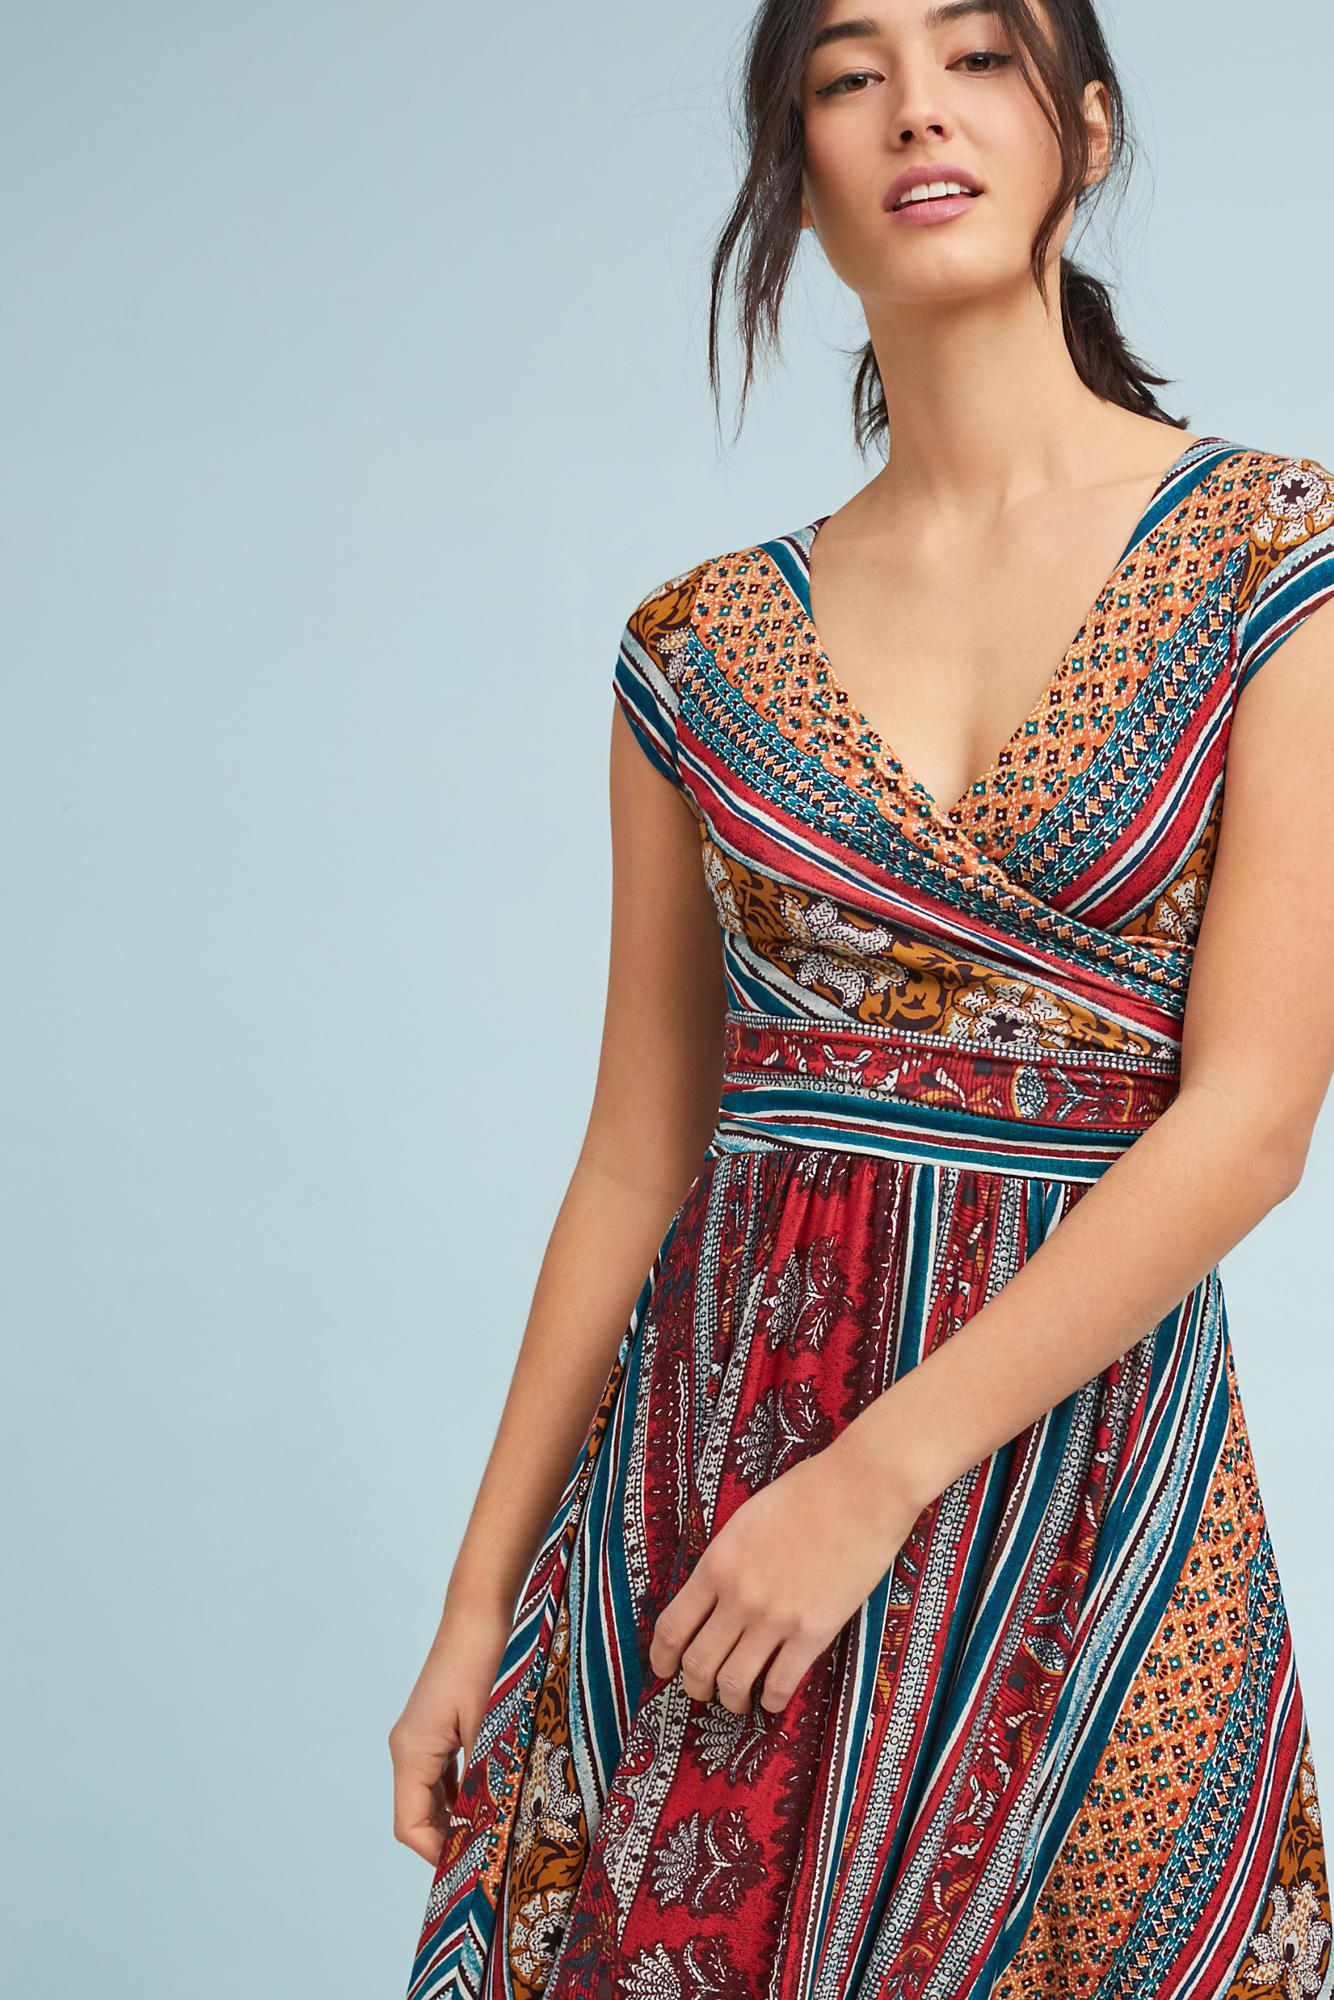 Lyst - Maeve Twinkling Wrap Dress in Red